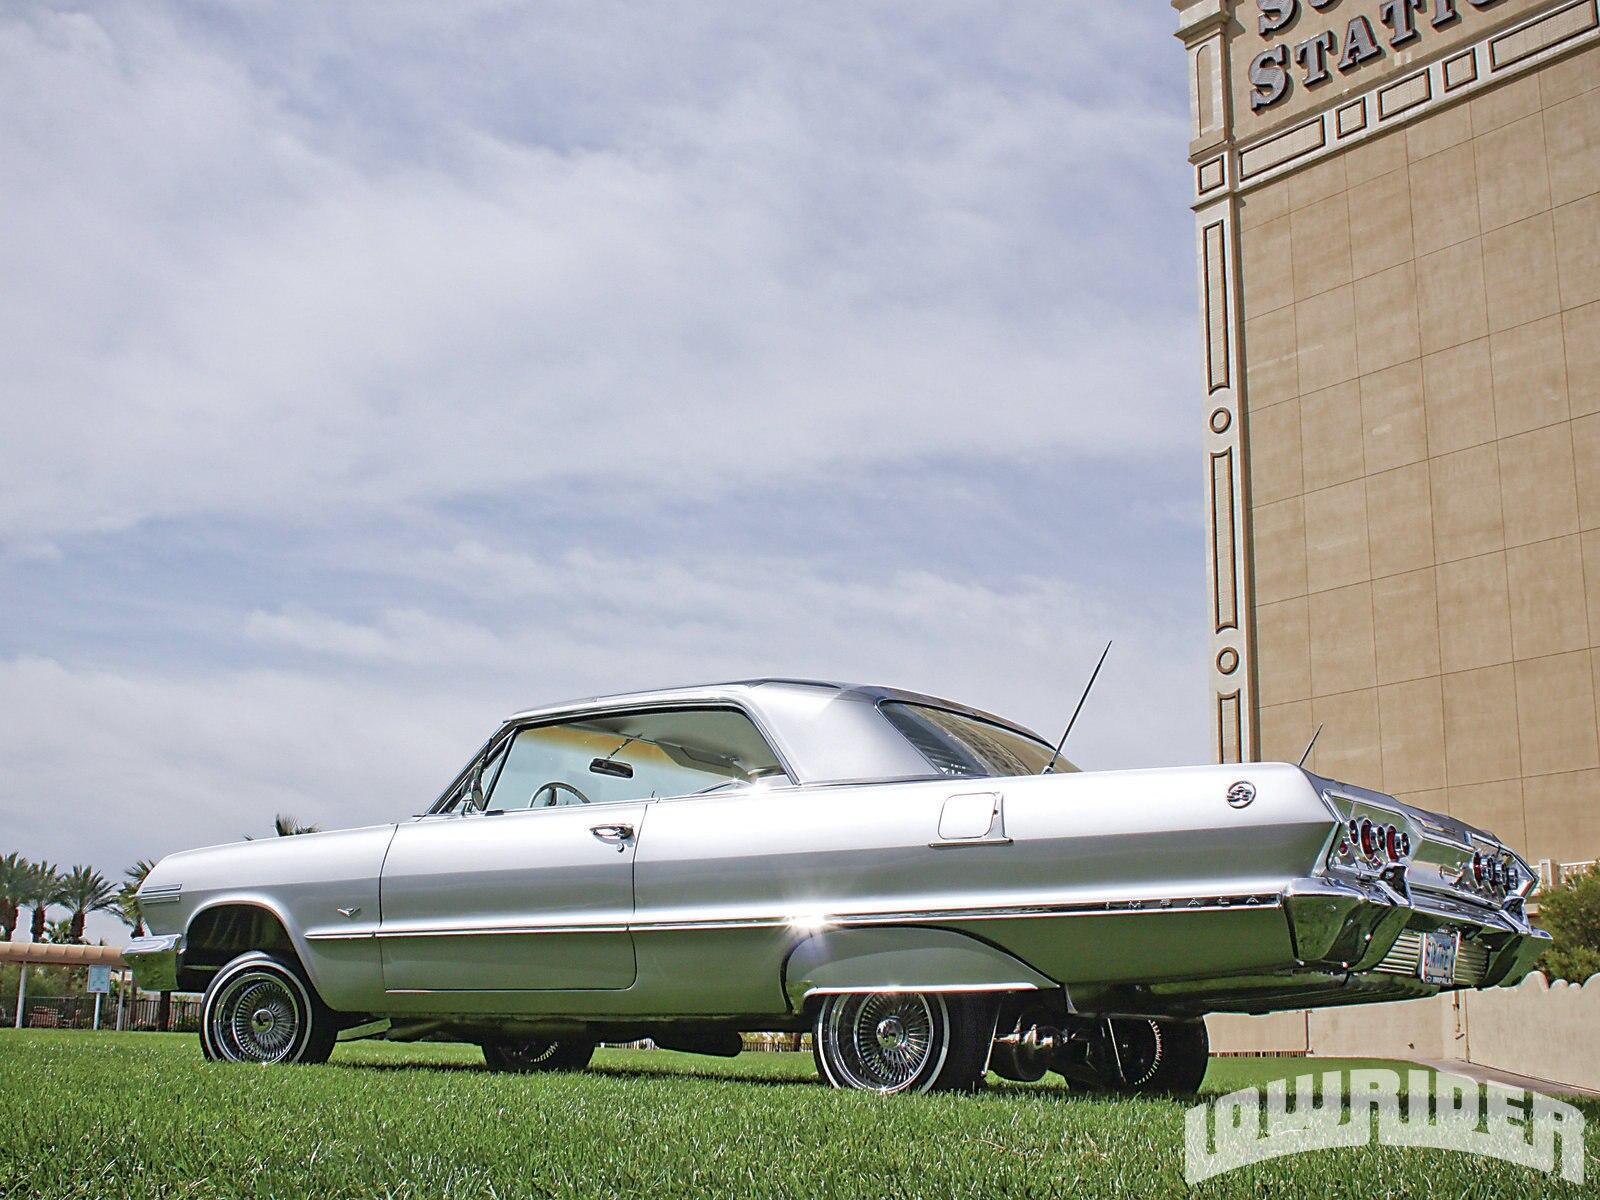 1211-lrmp-01-o-1963-chevrolet-impala-PPG-silver-star-finish1